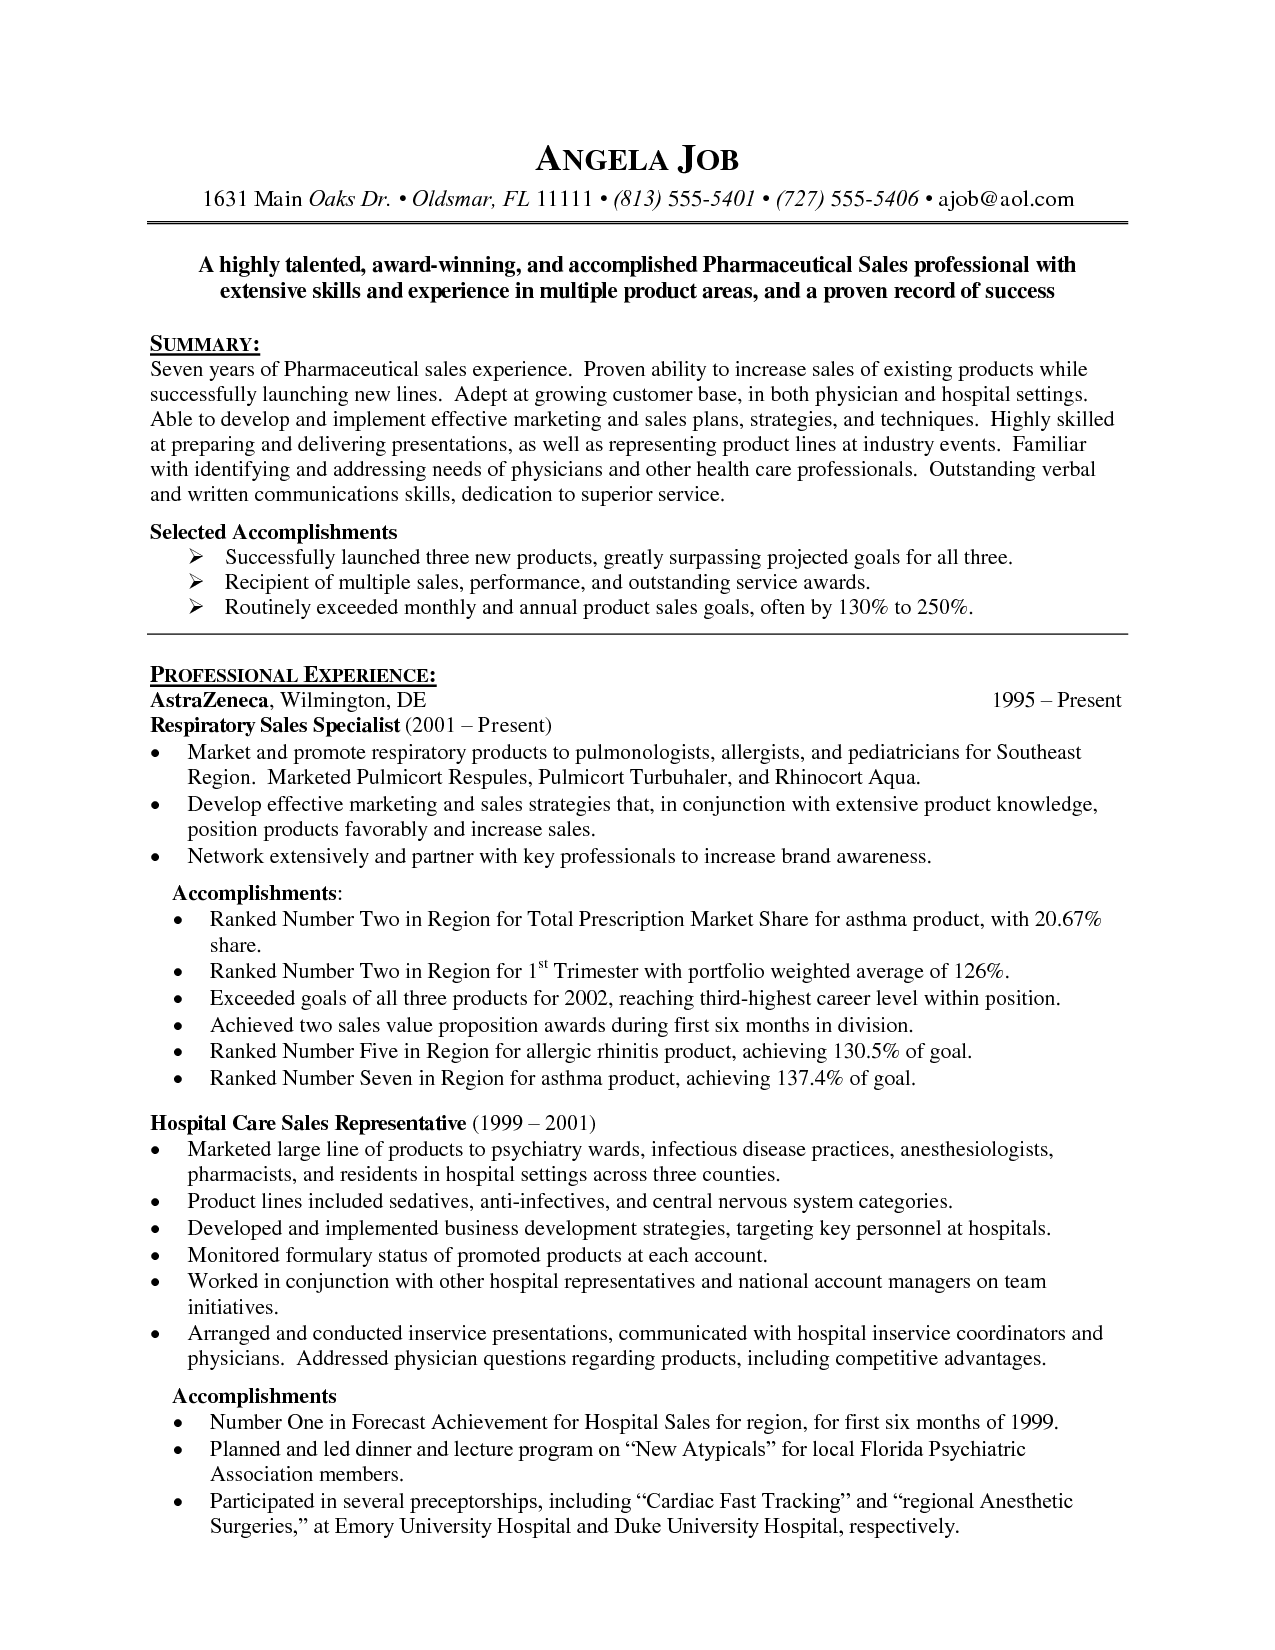 Pharmaceutical Sales Resume Examples Http Www Resumecareer Info Pharmaceutical Sales Resume Sales Resume Examples Sales Resume Pharmaceutical Sales Resume